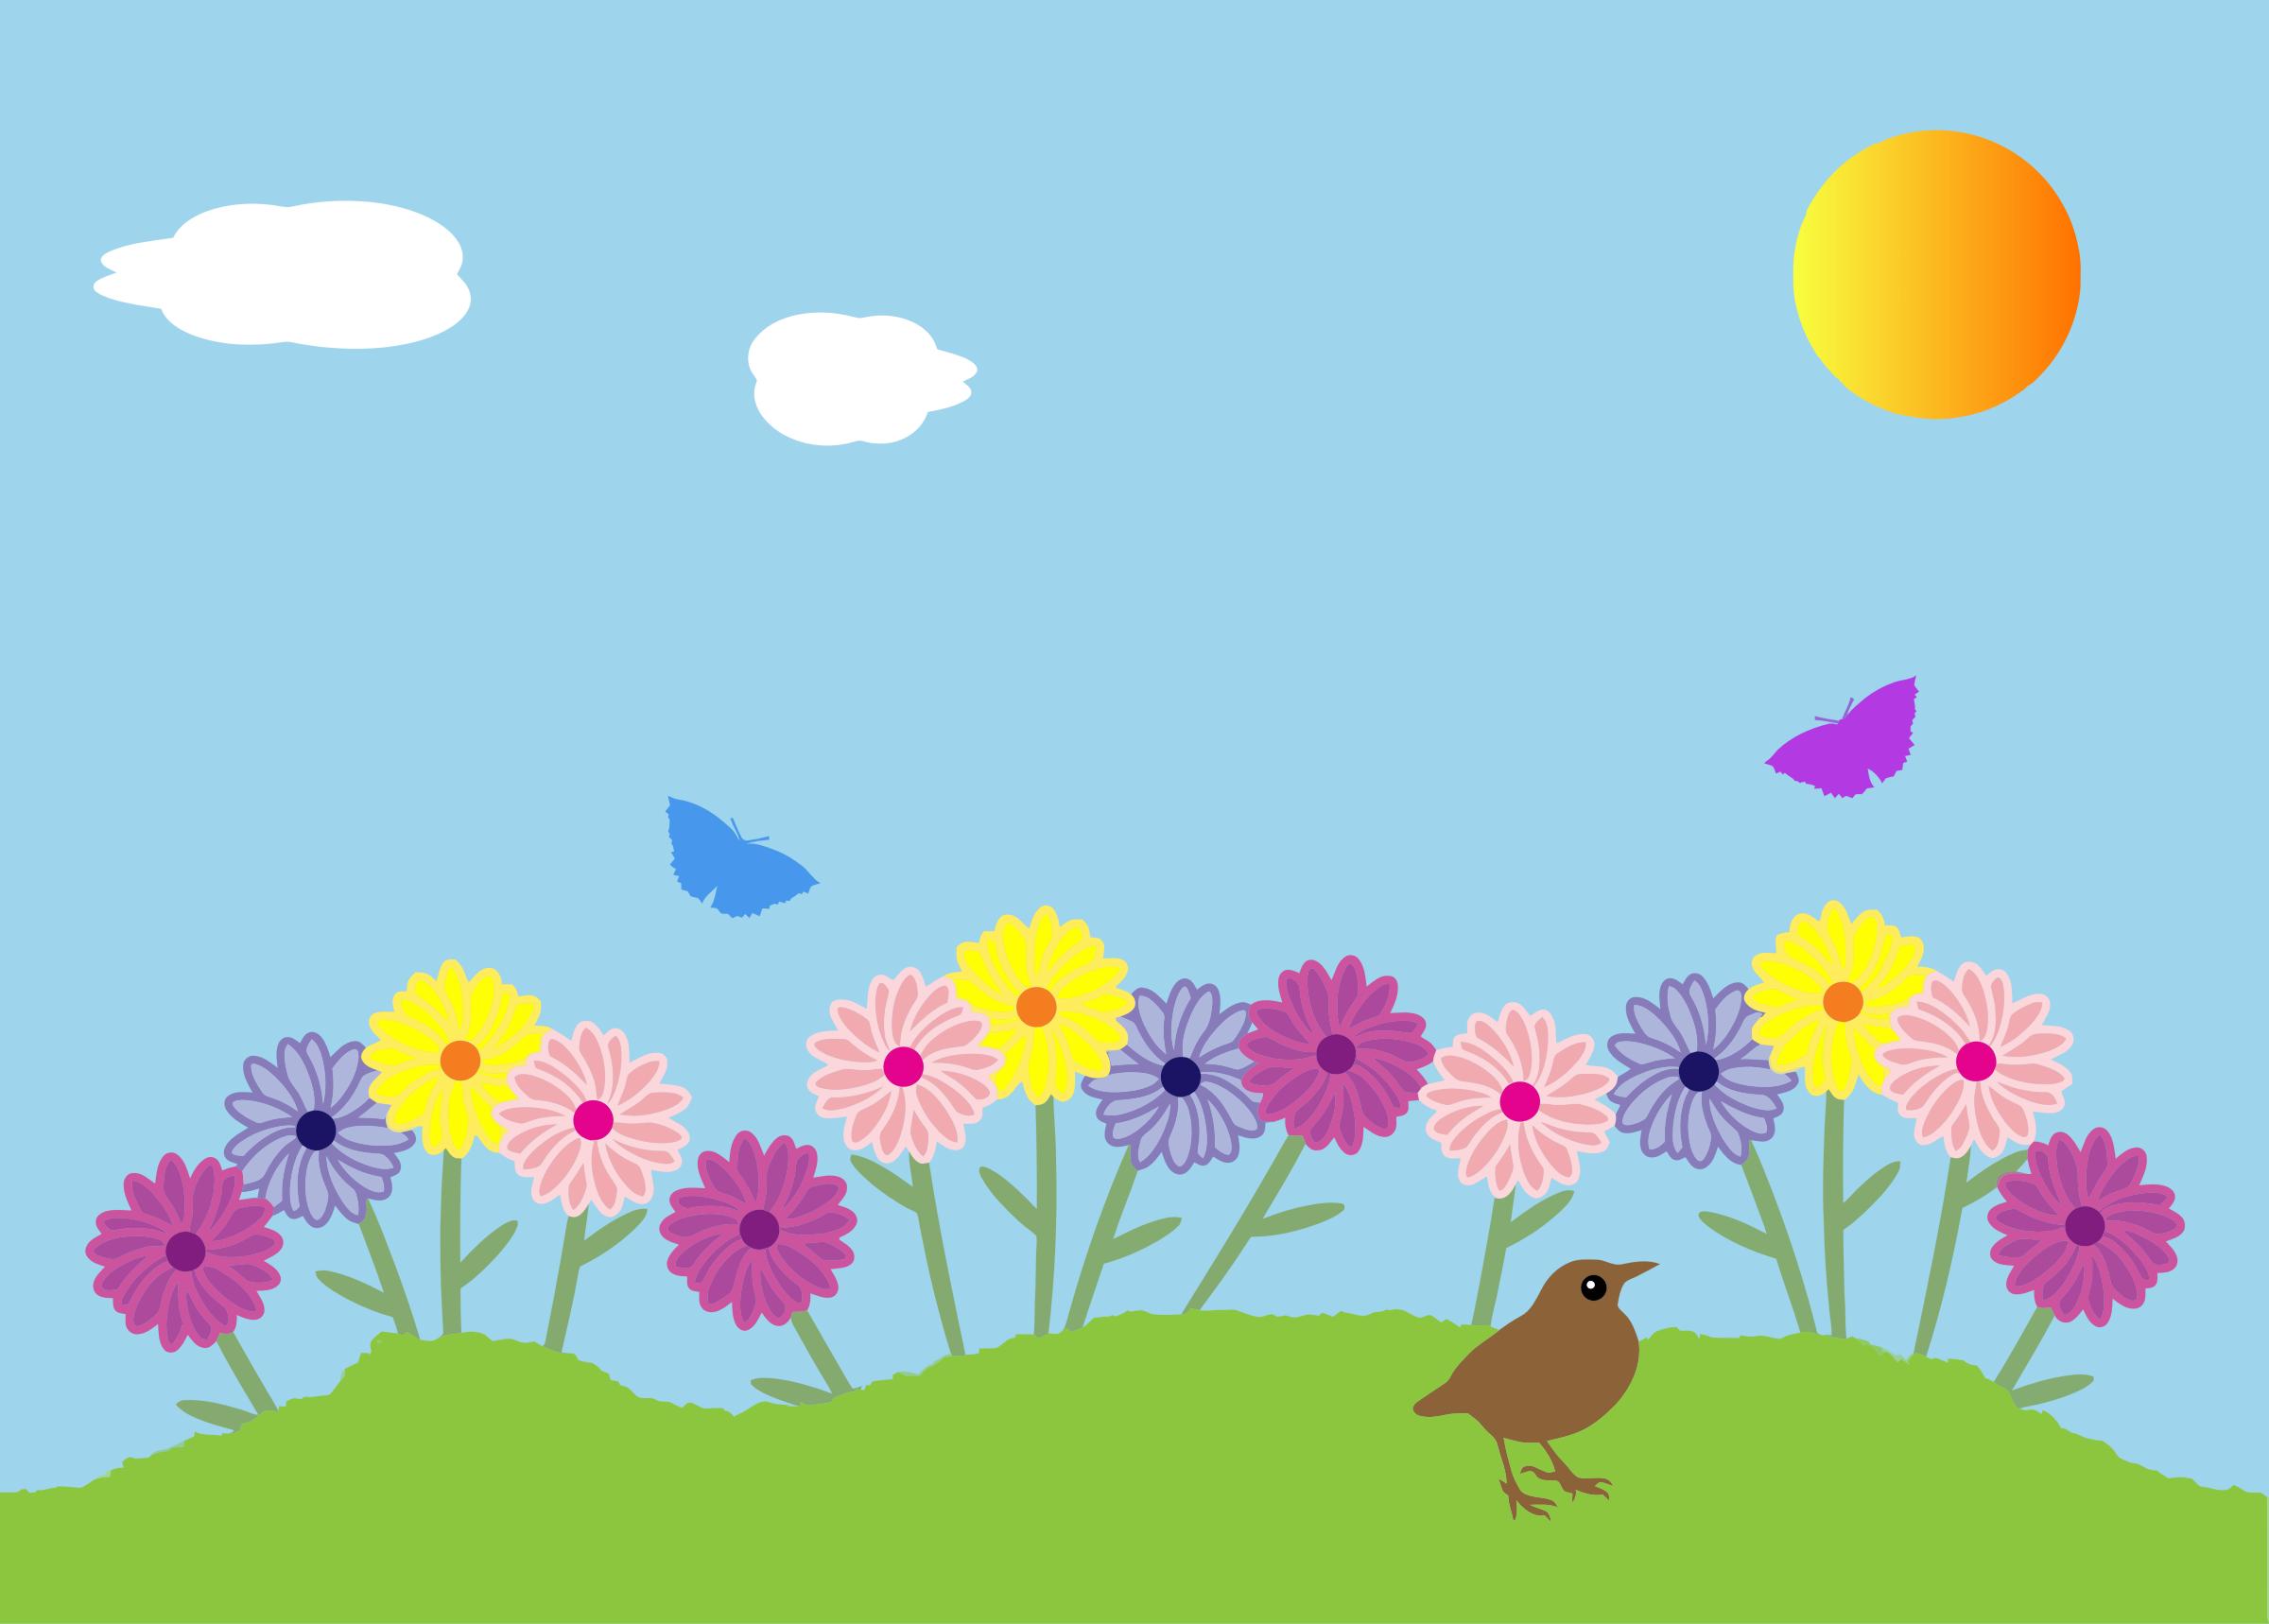 Free garden cliparts download. Gardener clipart flower bed